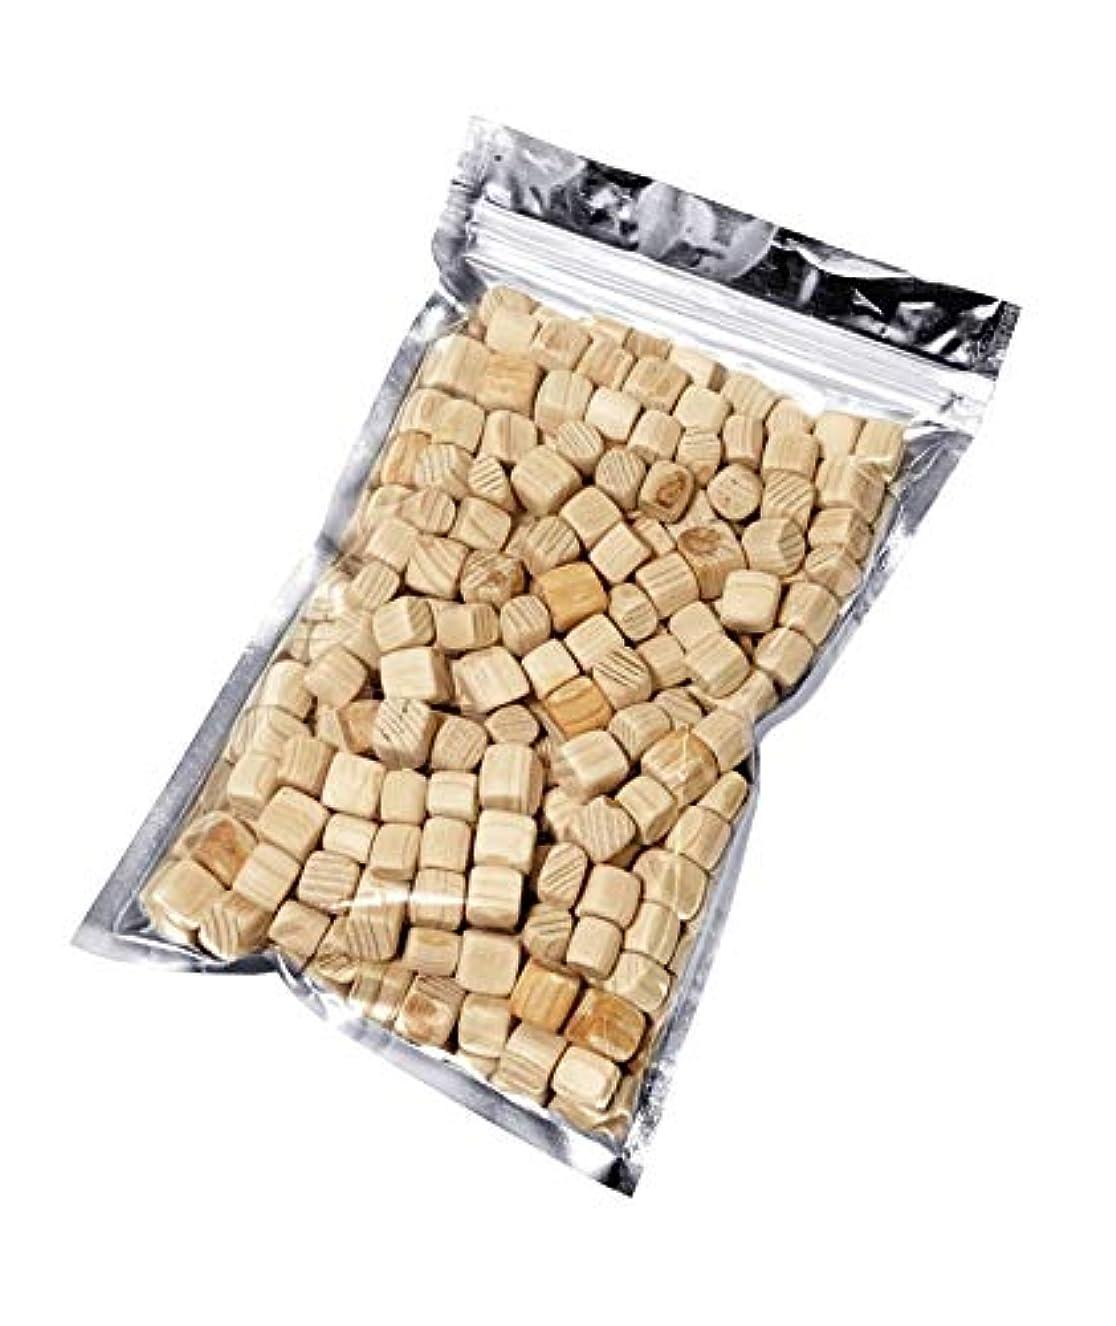 kicoriya 国産ヒノキ キューブ状ブロック 90g サシェ用袋付き